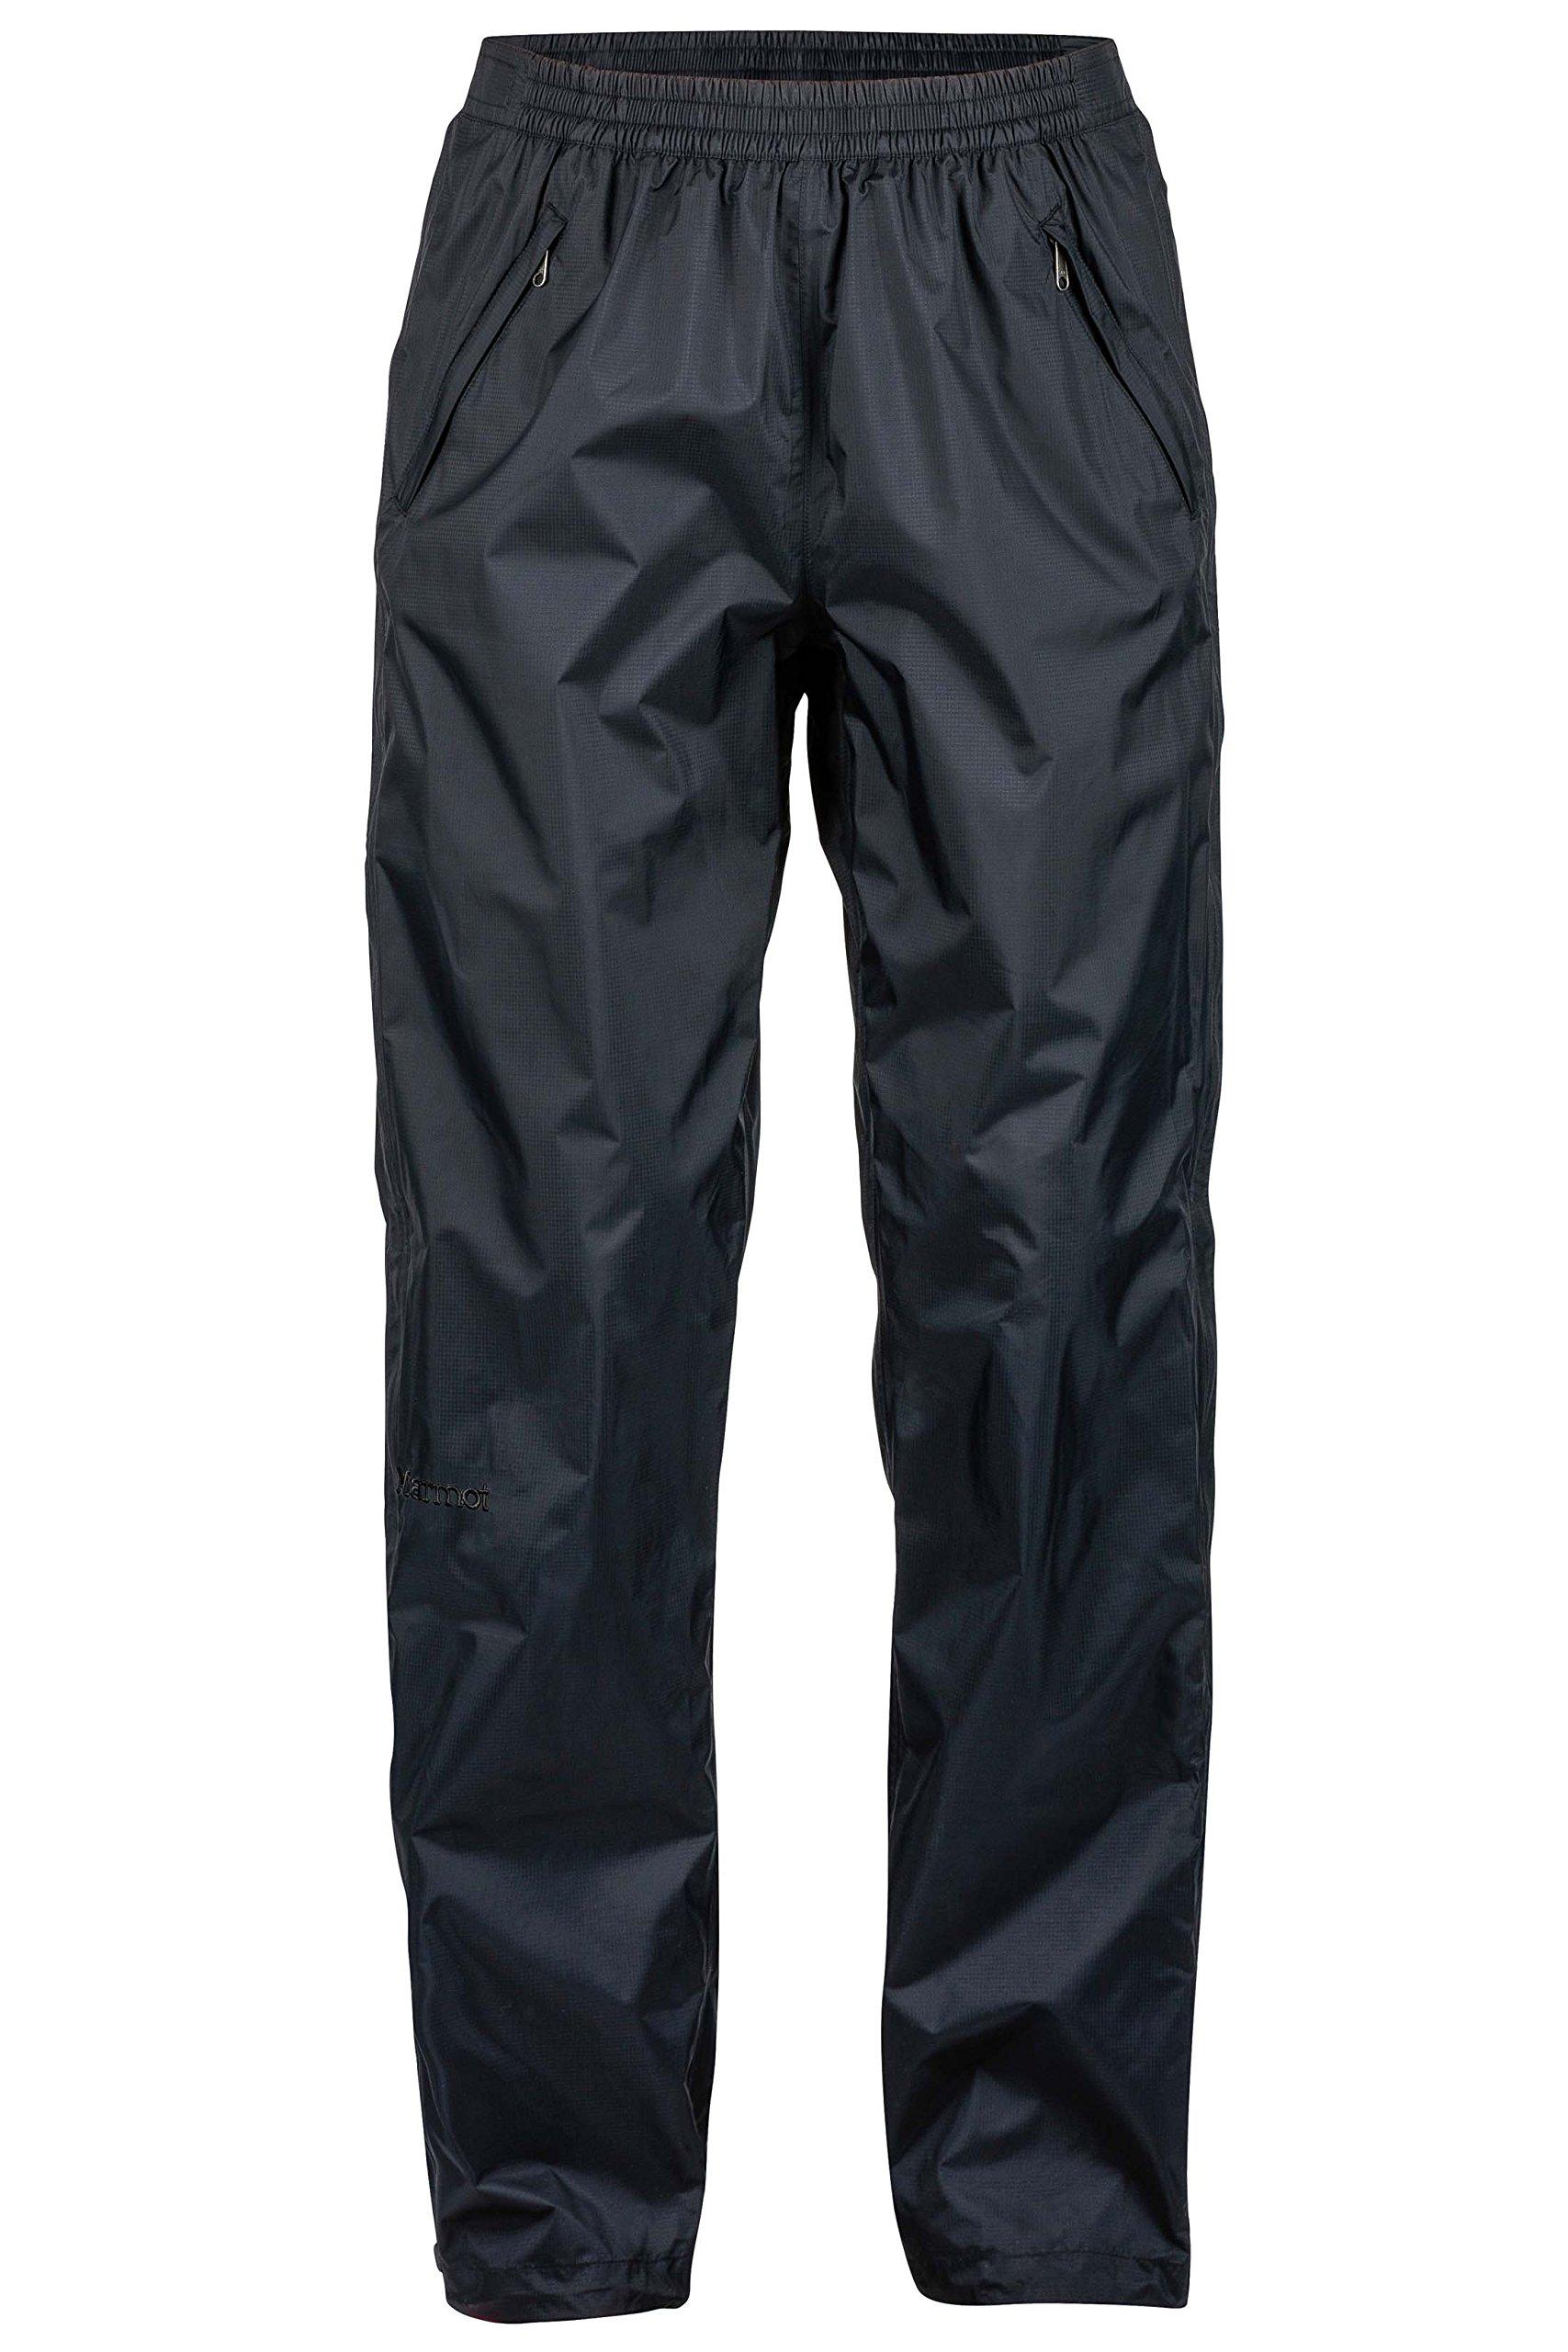 Marmot PreCip Women's Lightweight Waterproof Full-Zip Pant, Jet Black, X-Large